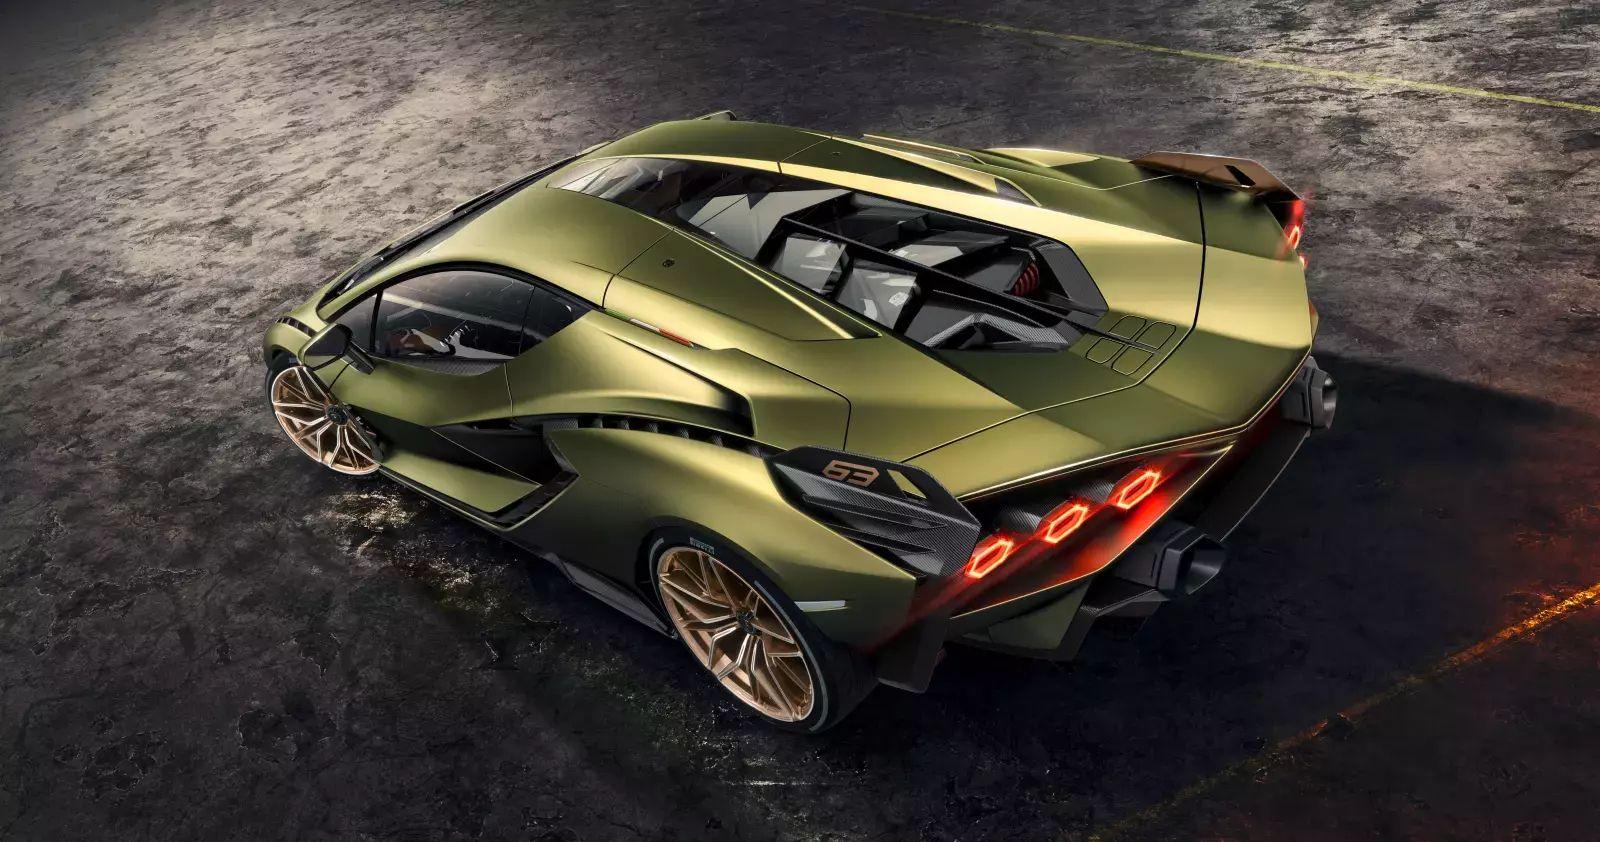 Supercapacitor Equipped Lamborghini Sian Aims To Revolutionize EVs, Hybrids